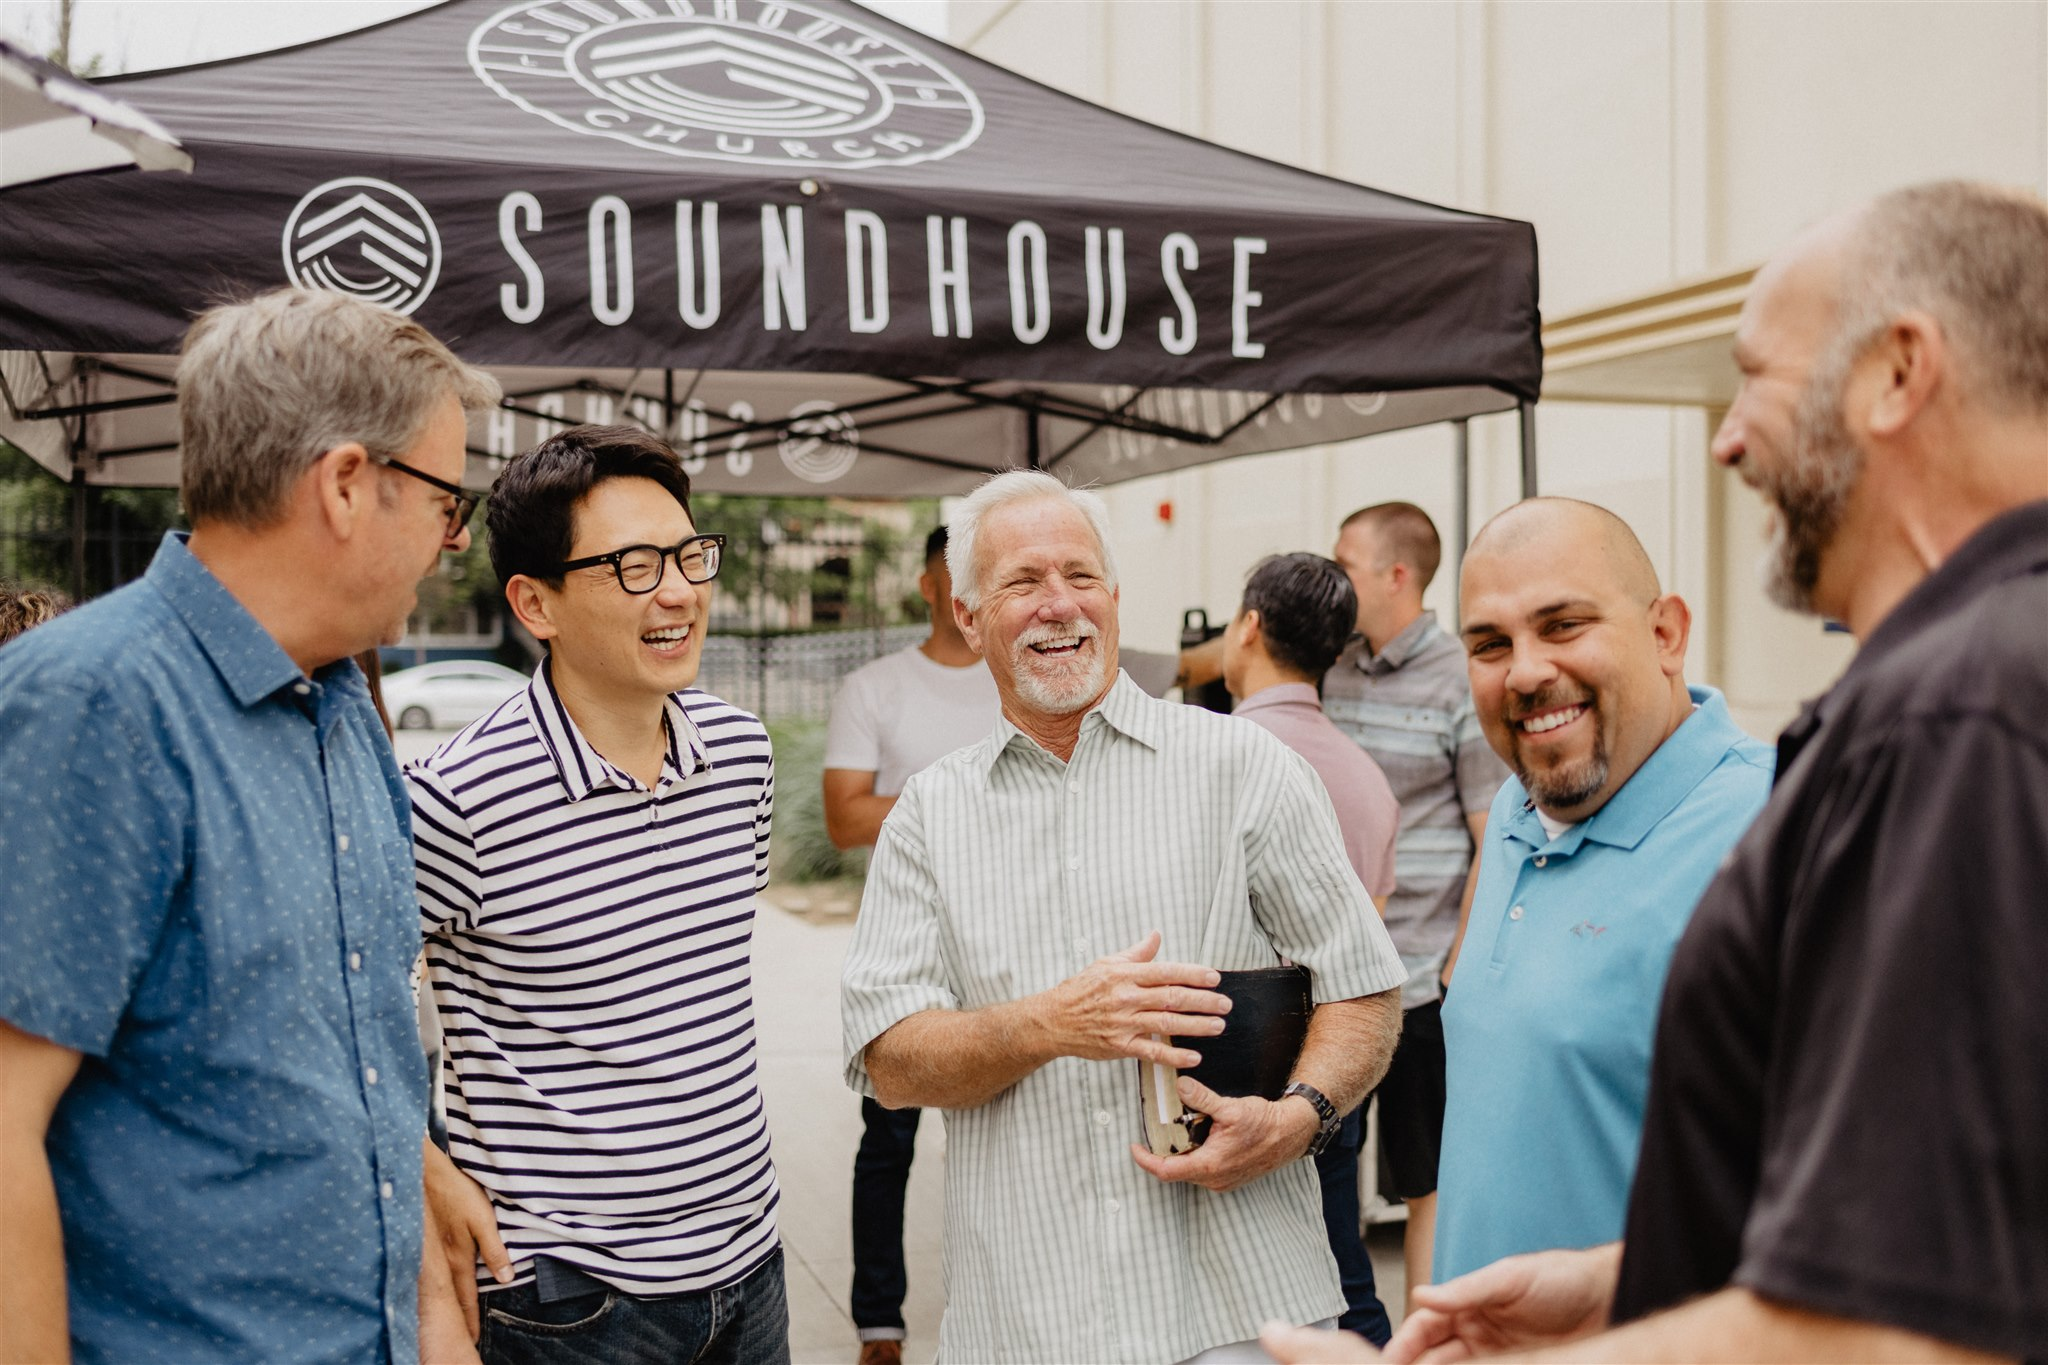 021-sound_house_church-June_23__2019.jpg